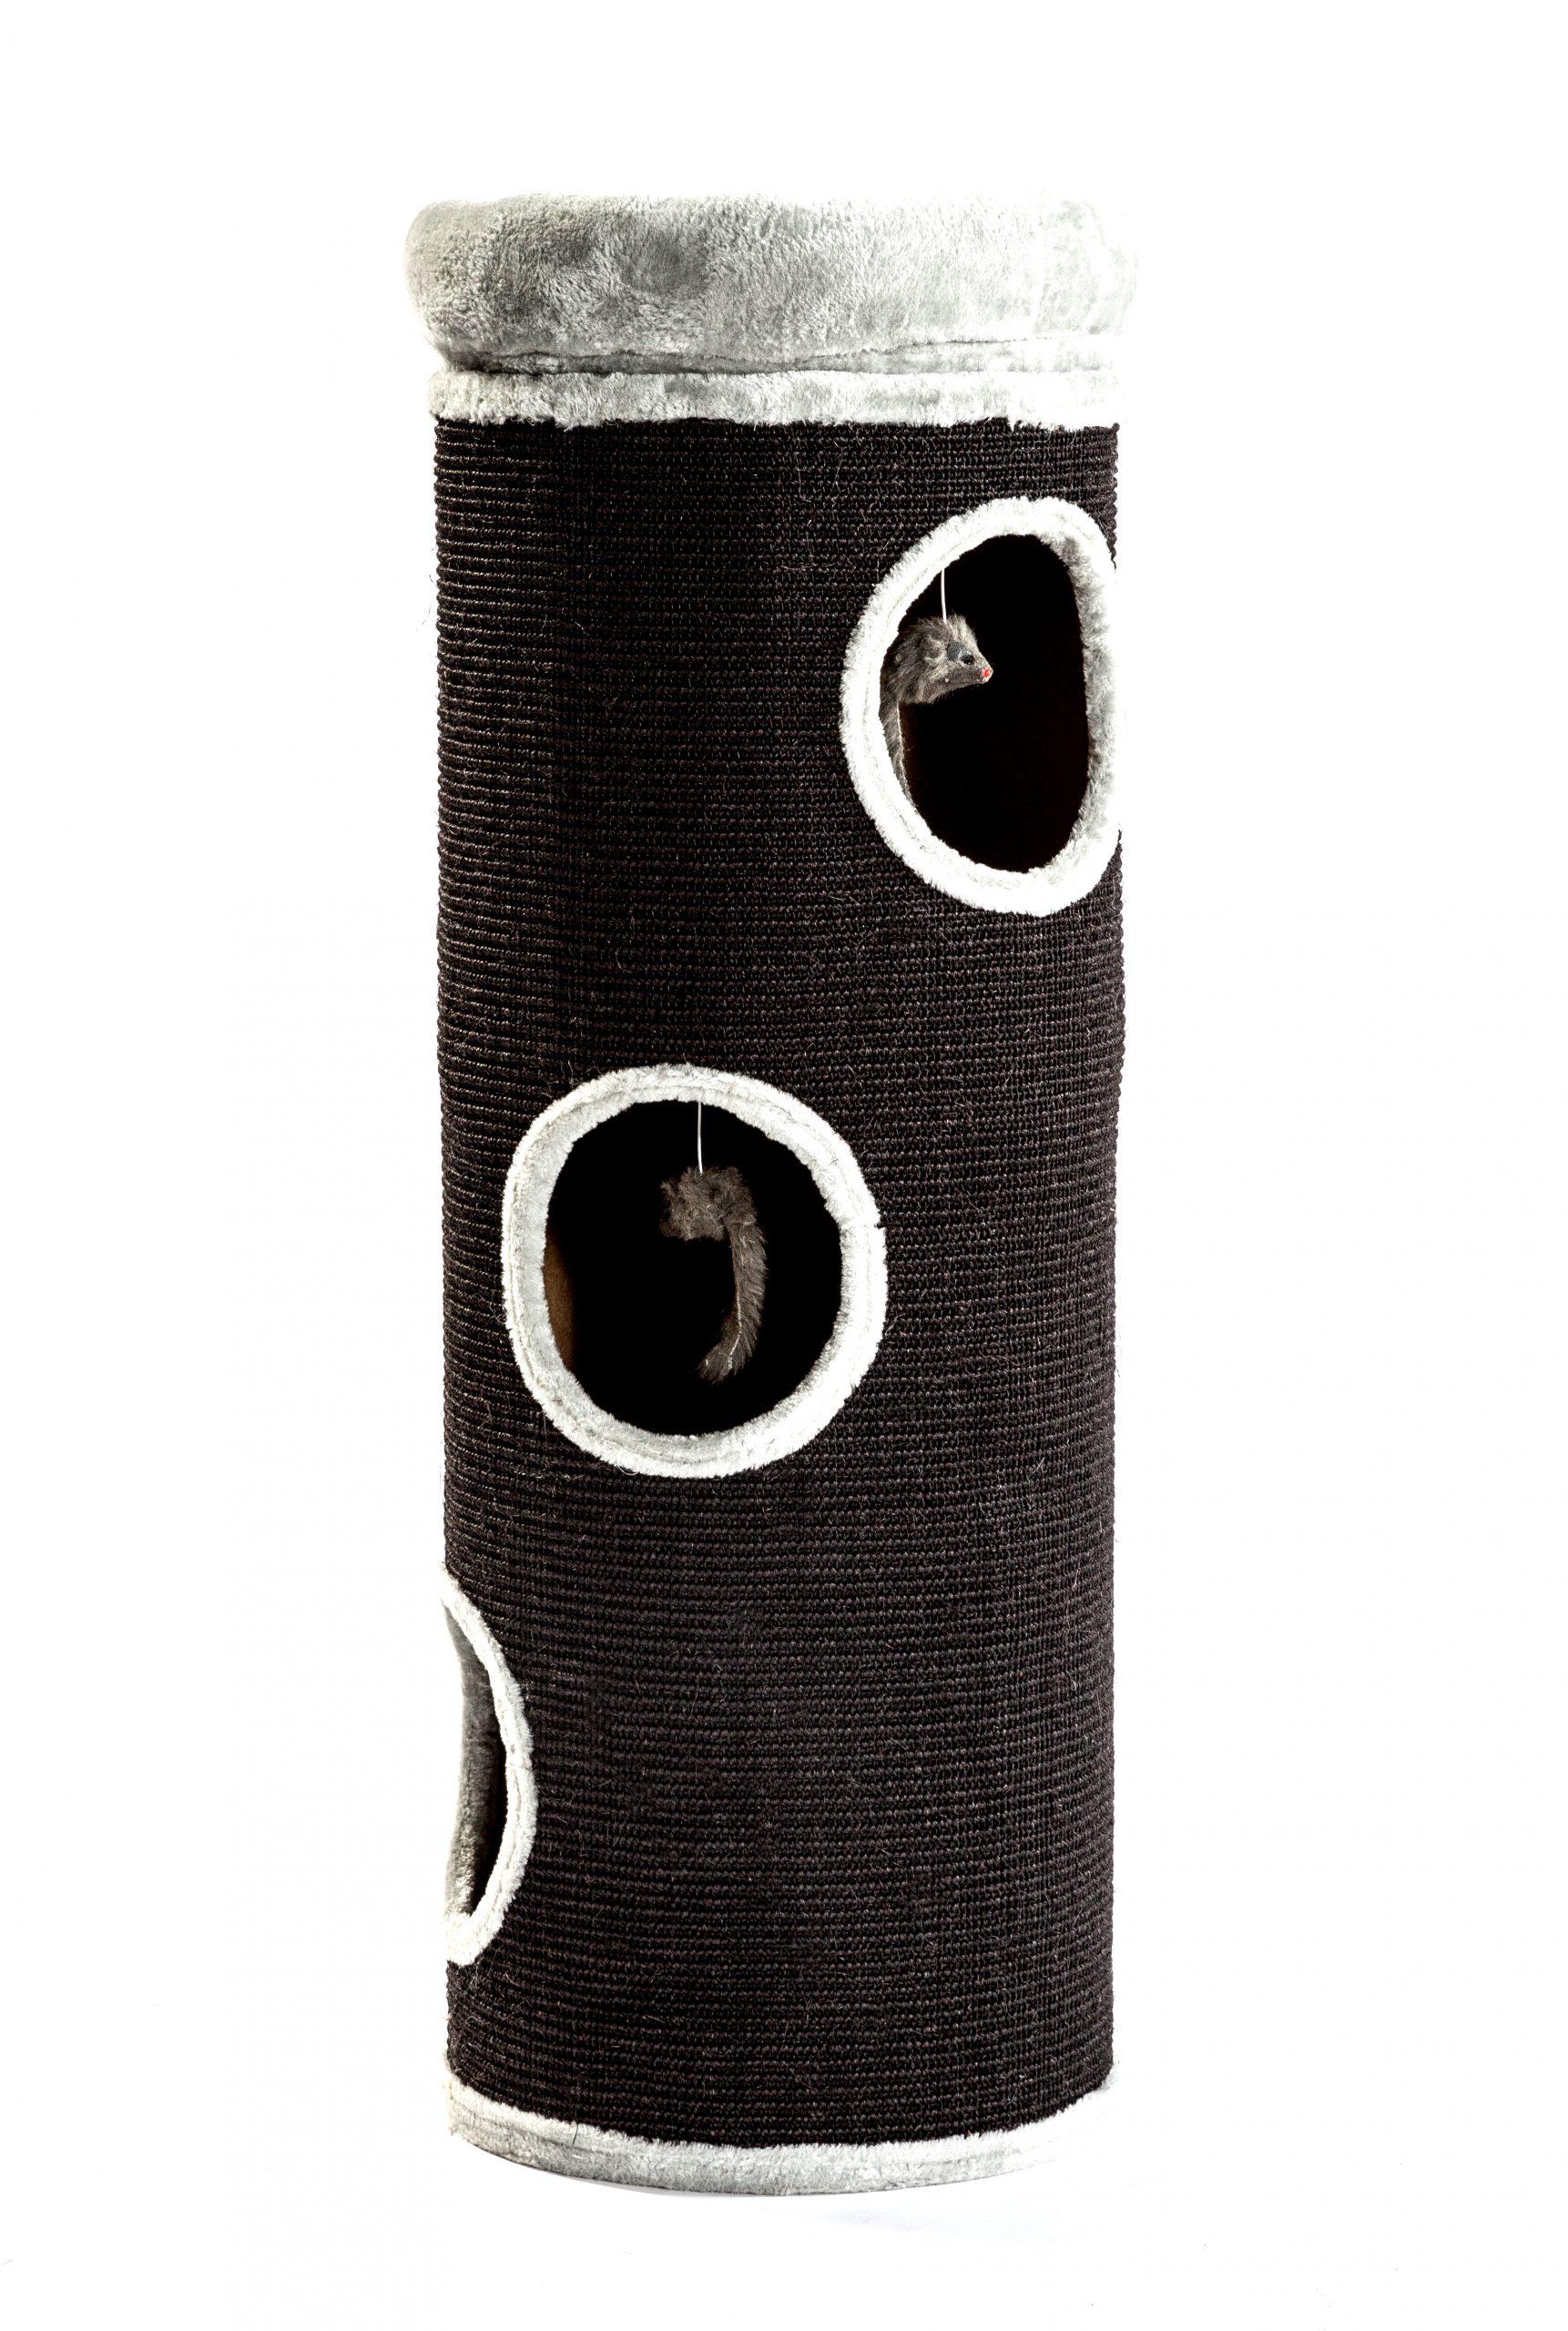 Adori-Krabton-Pascal-Zwart-Krabpaal-O45x100-cm